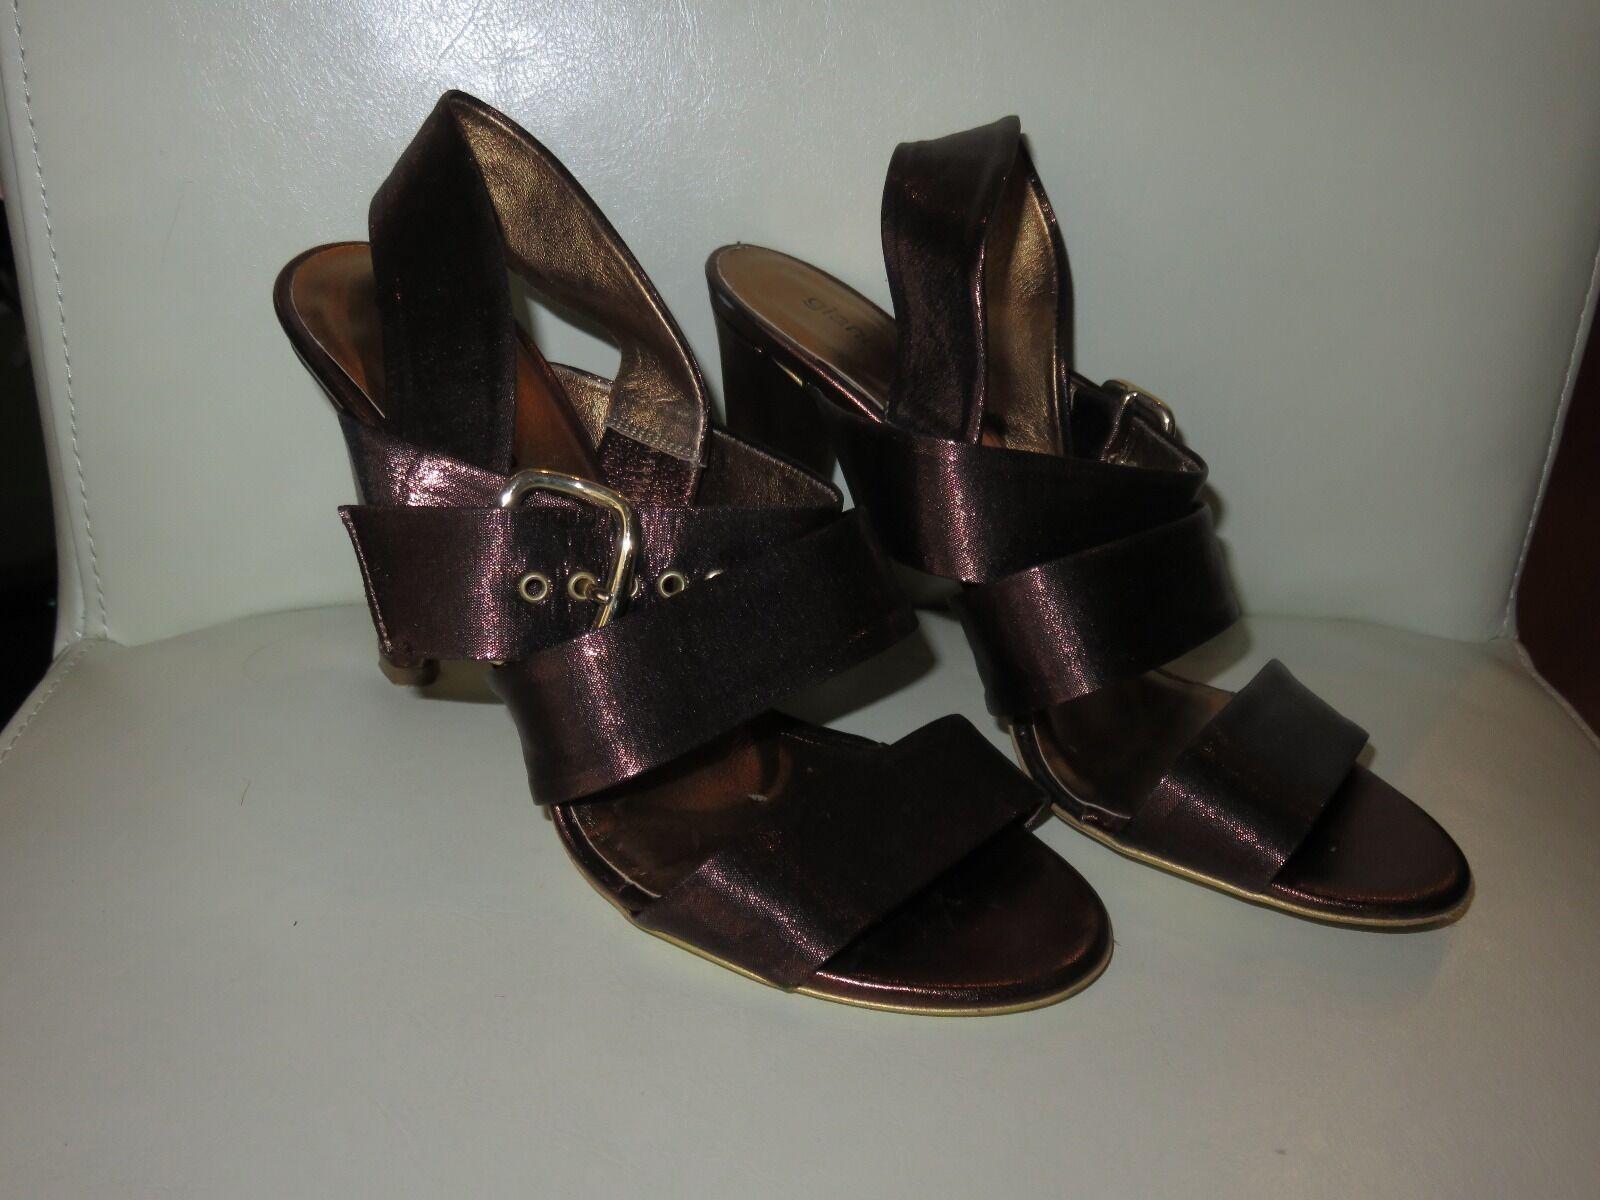 New Gianna Meliani Italian leather women's sandals copper shimmer, size 36.5